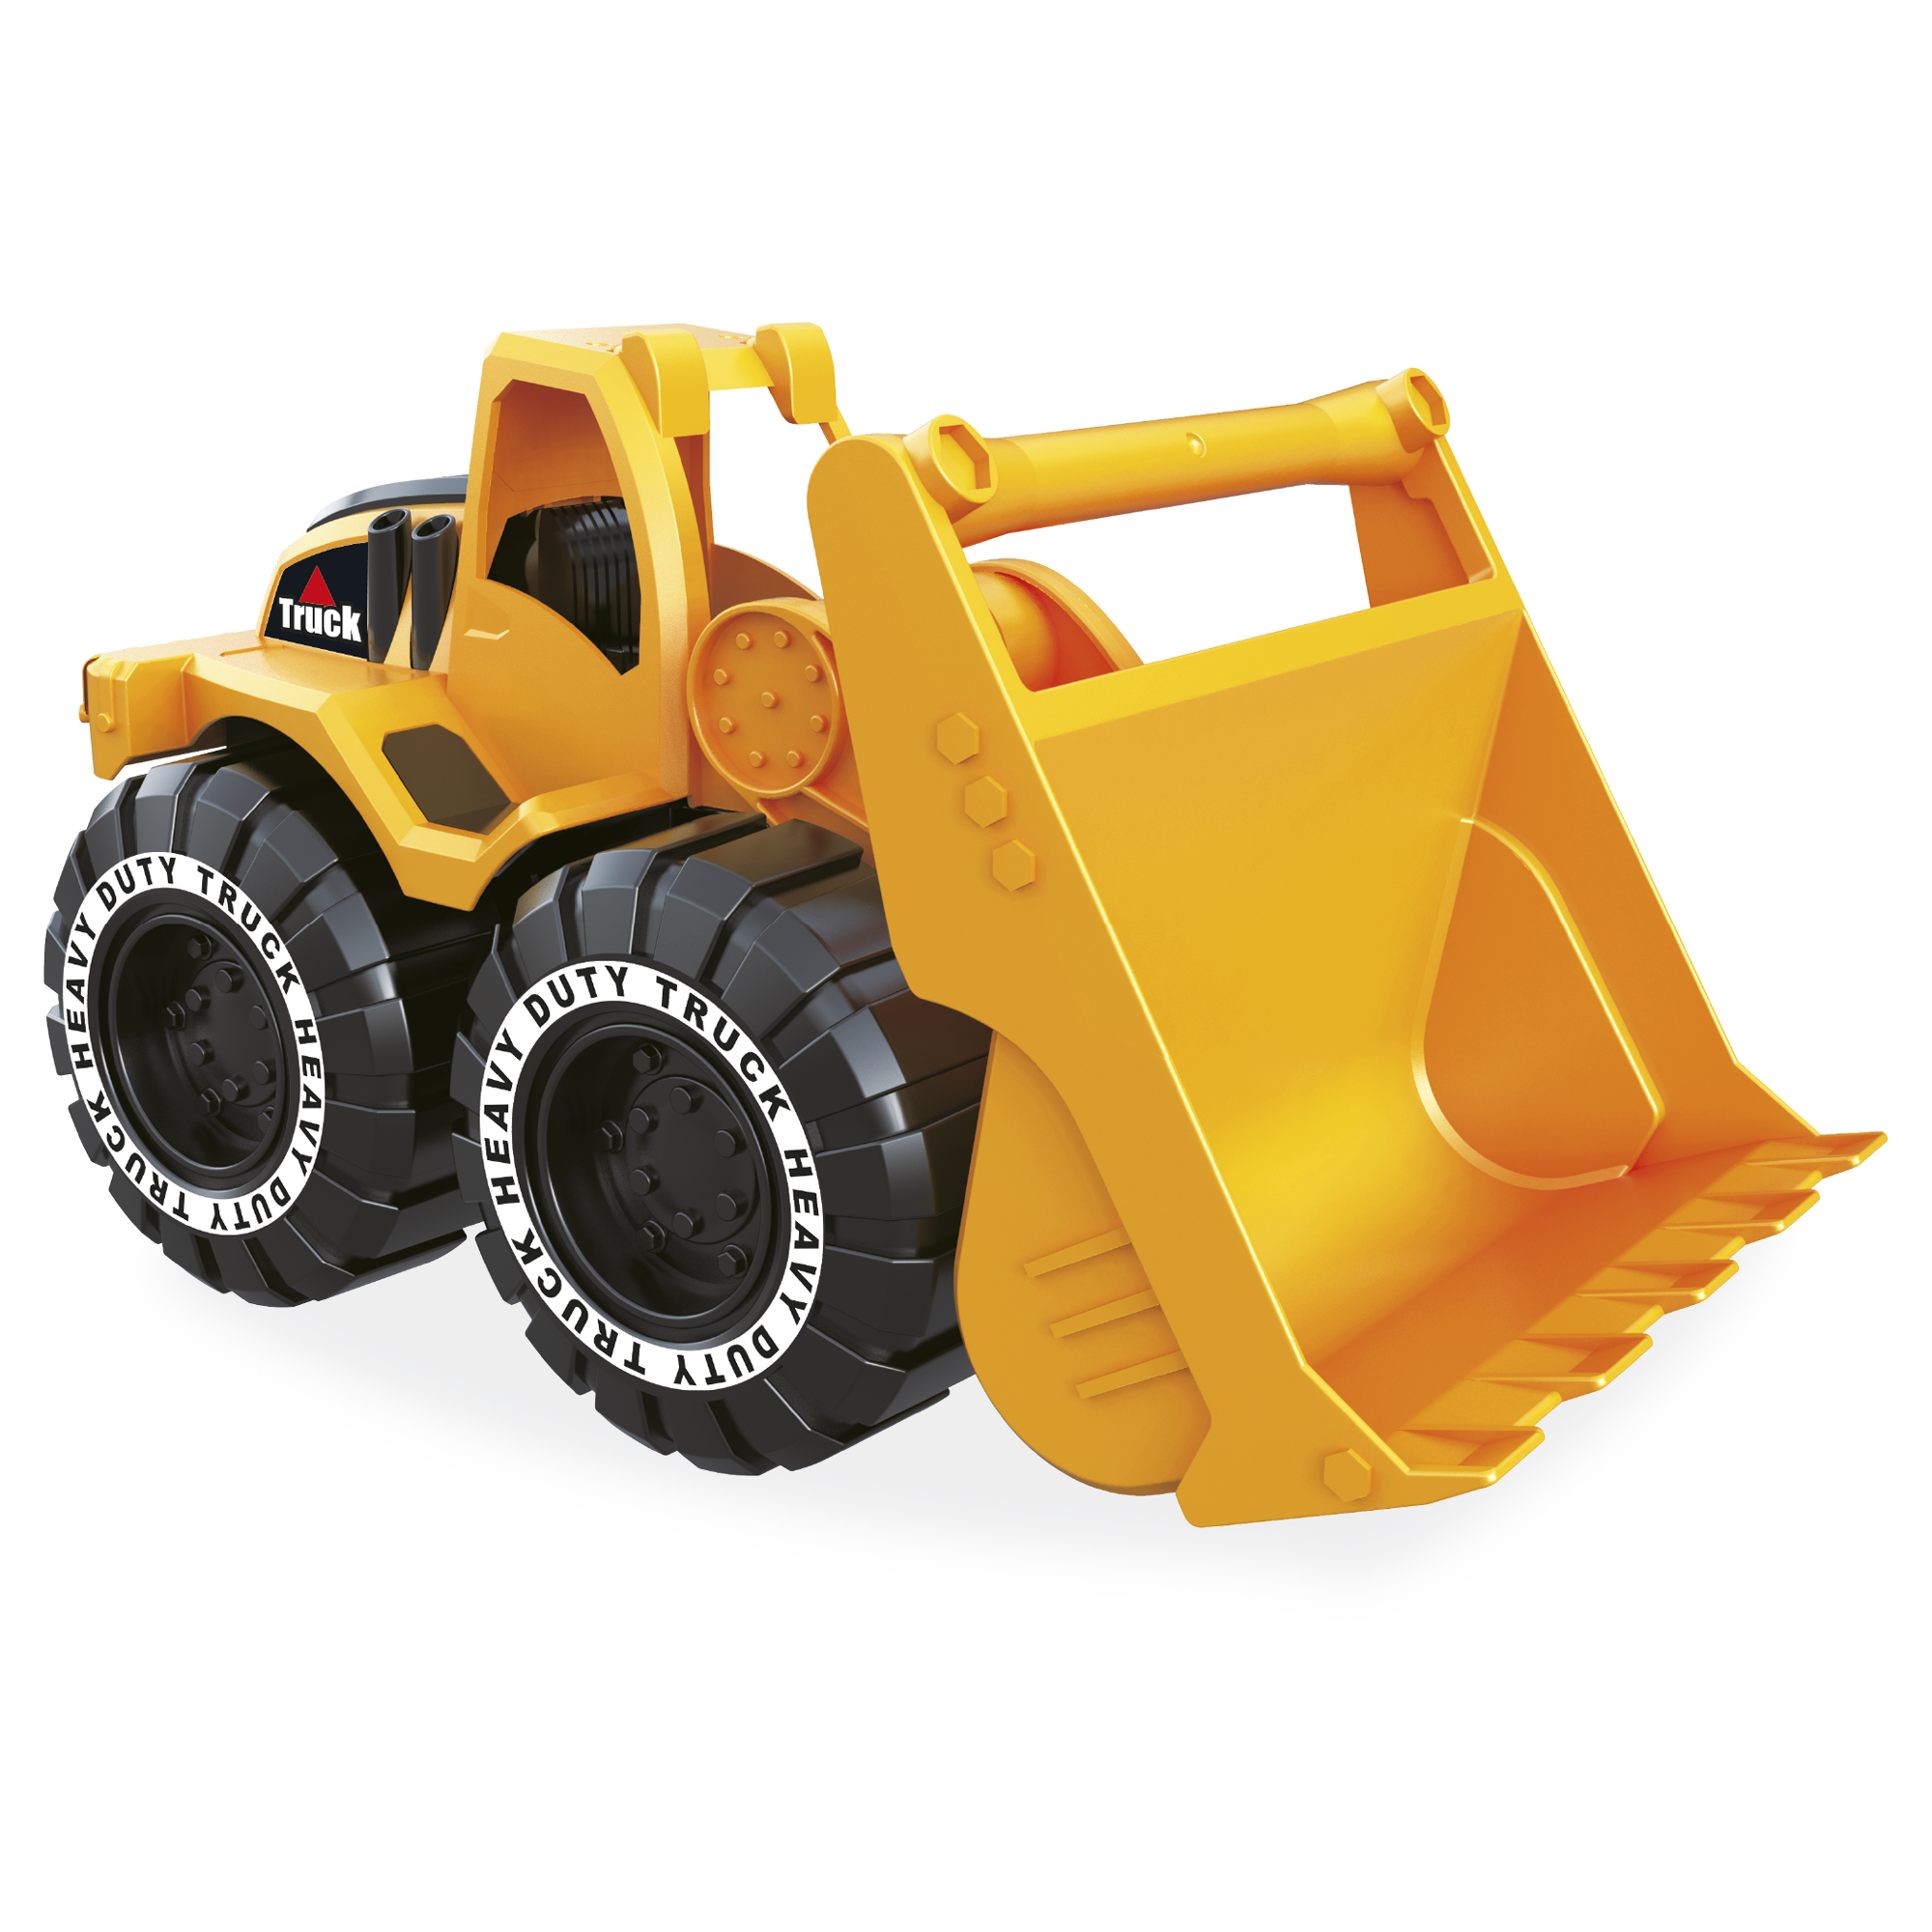 Big construction truck - MOTOR&CO